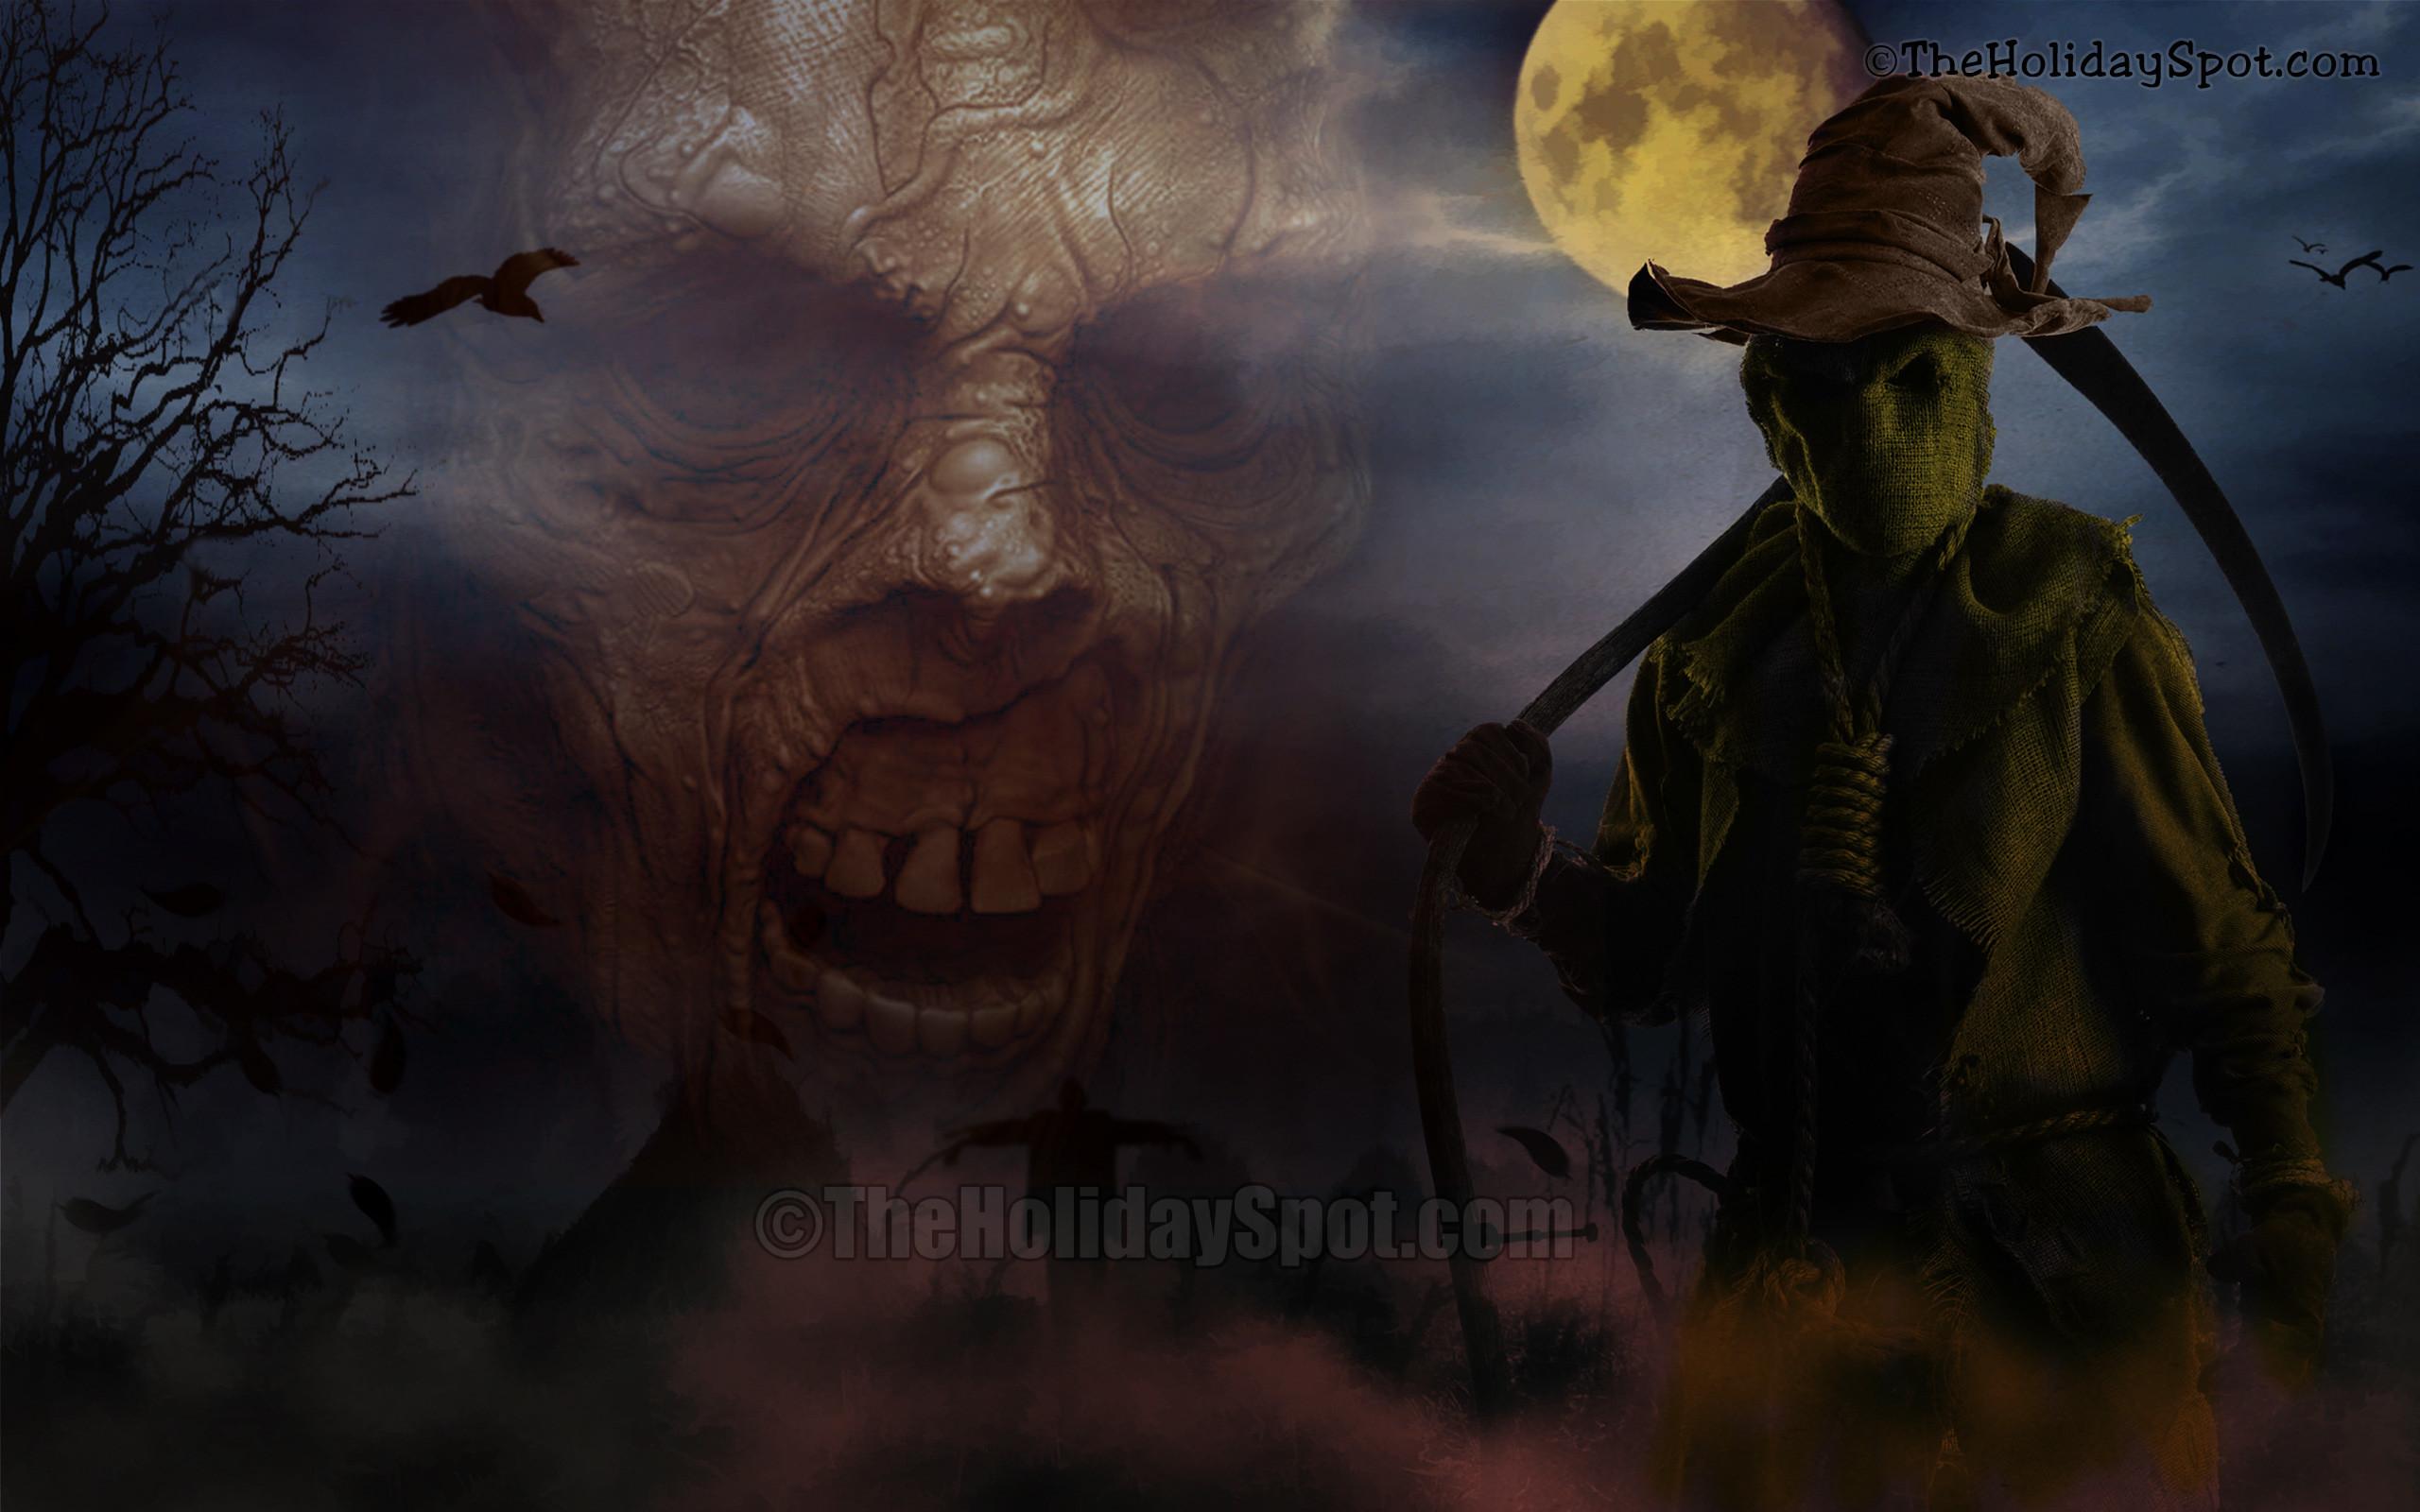 Res: 2560x1600, Wallpaper - Demons at Halloween Night